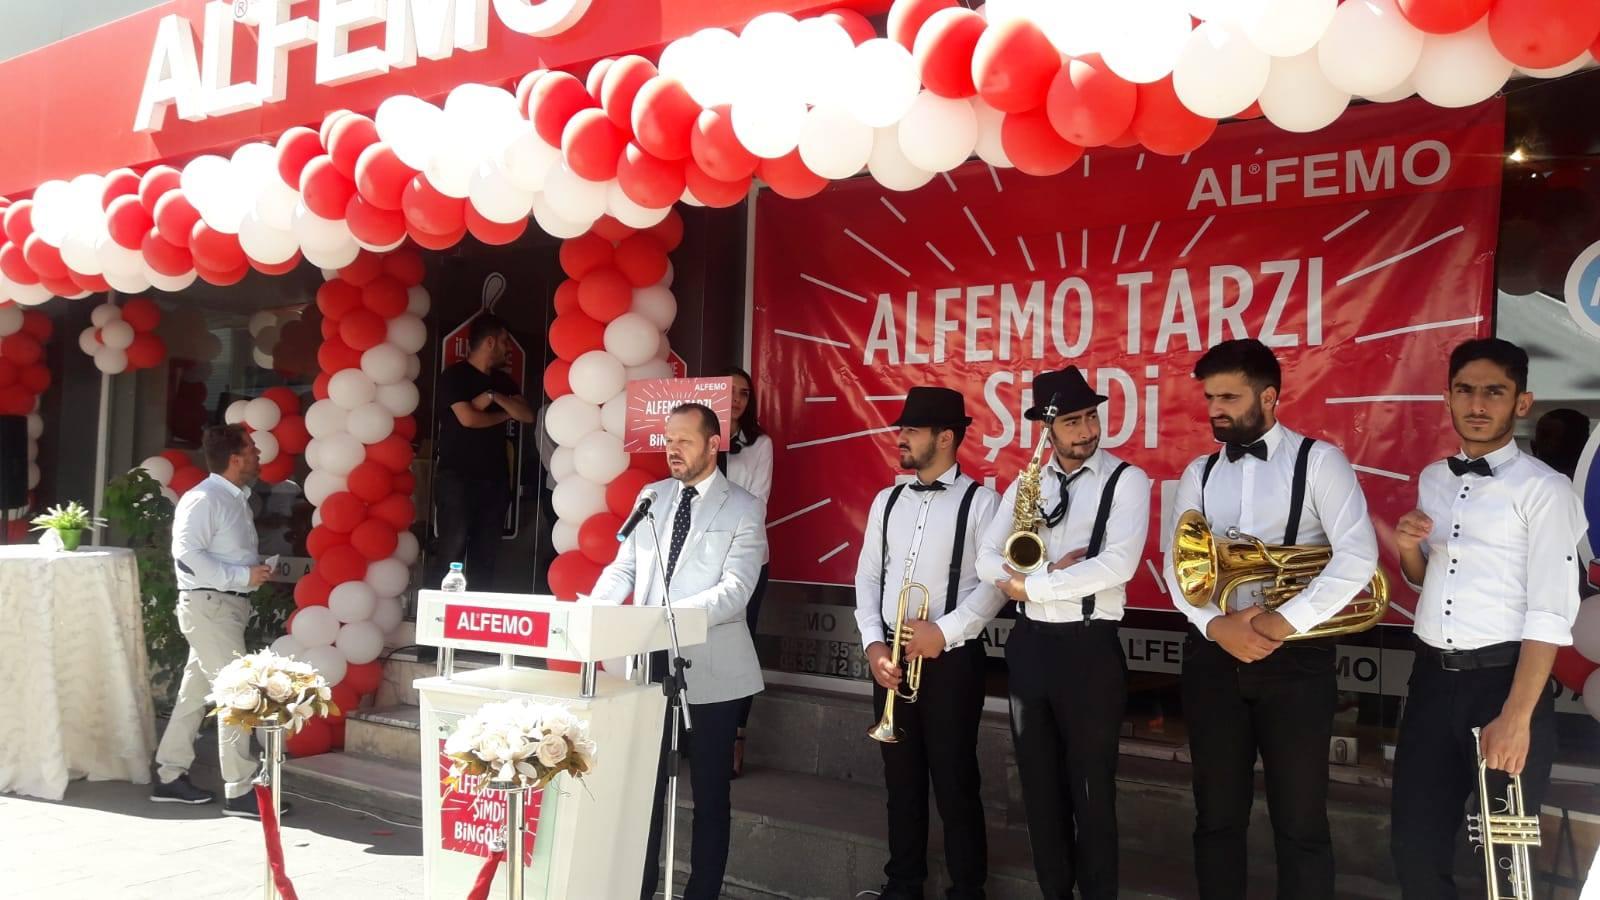 Alfemo'dan 1 haftada 3 mağaza açılışı birden